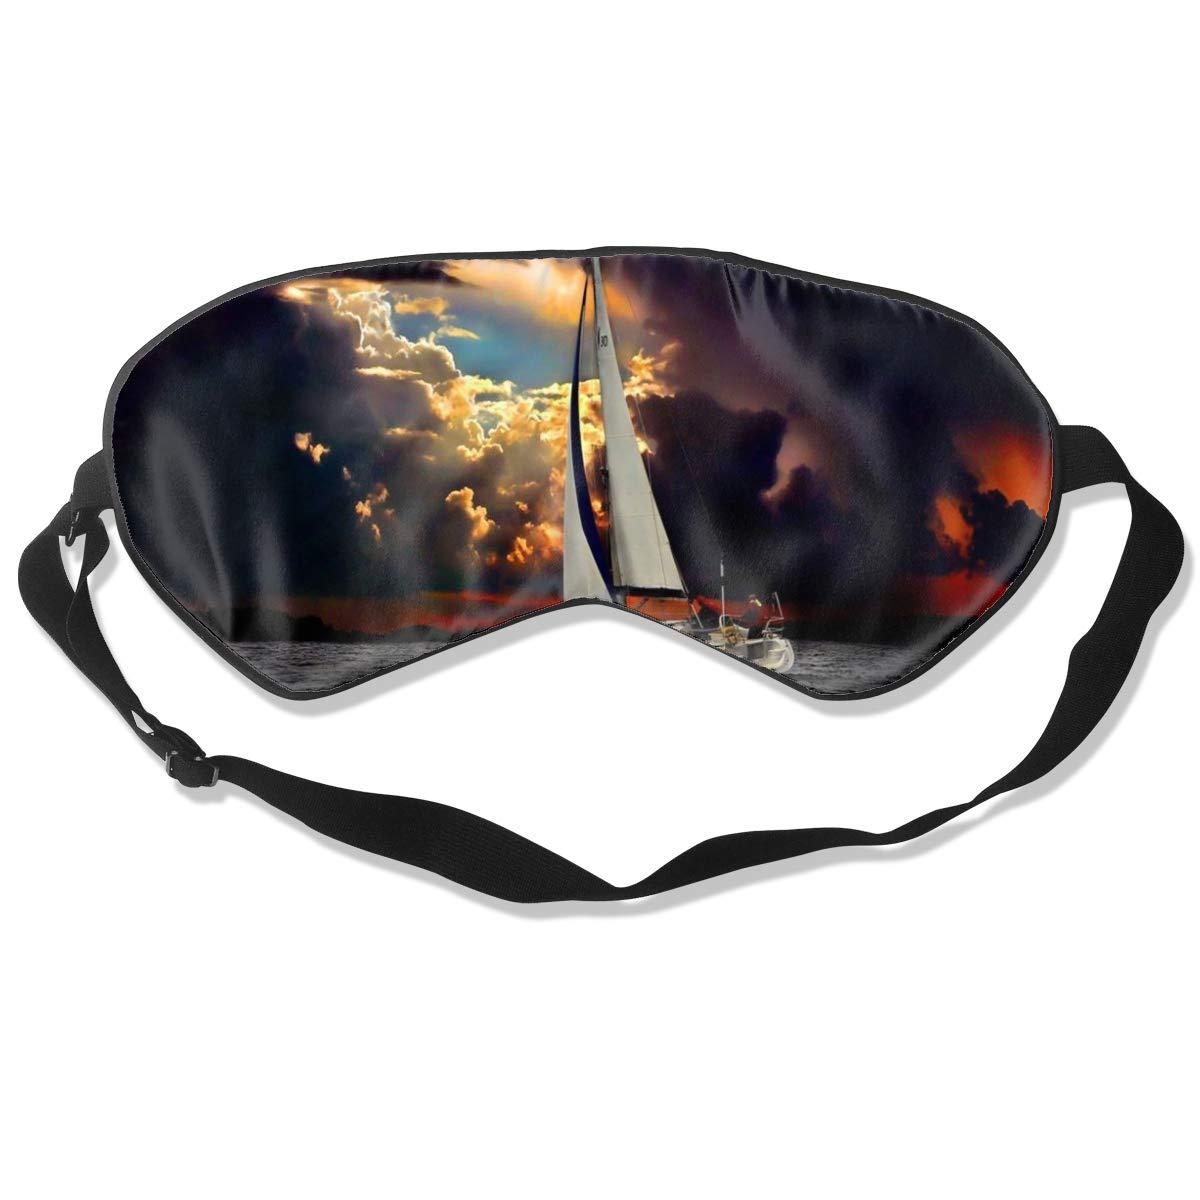 100% Silk Sleep Eye Mask, Sailboat Black Cloud Night Sleep Mask, Meditation With Adjustable Straps, Blocks Light, Suitable For Sleeping Travel Work Naps